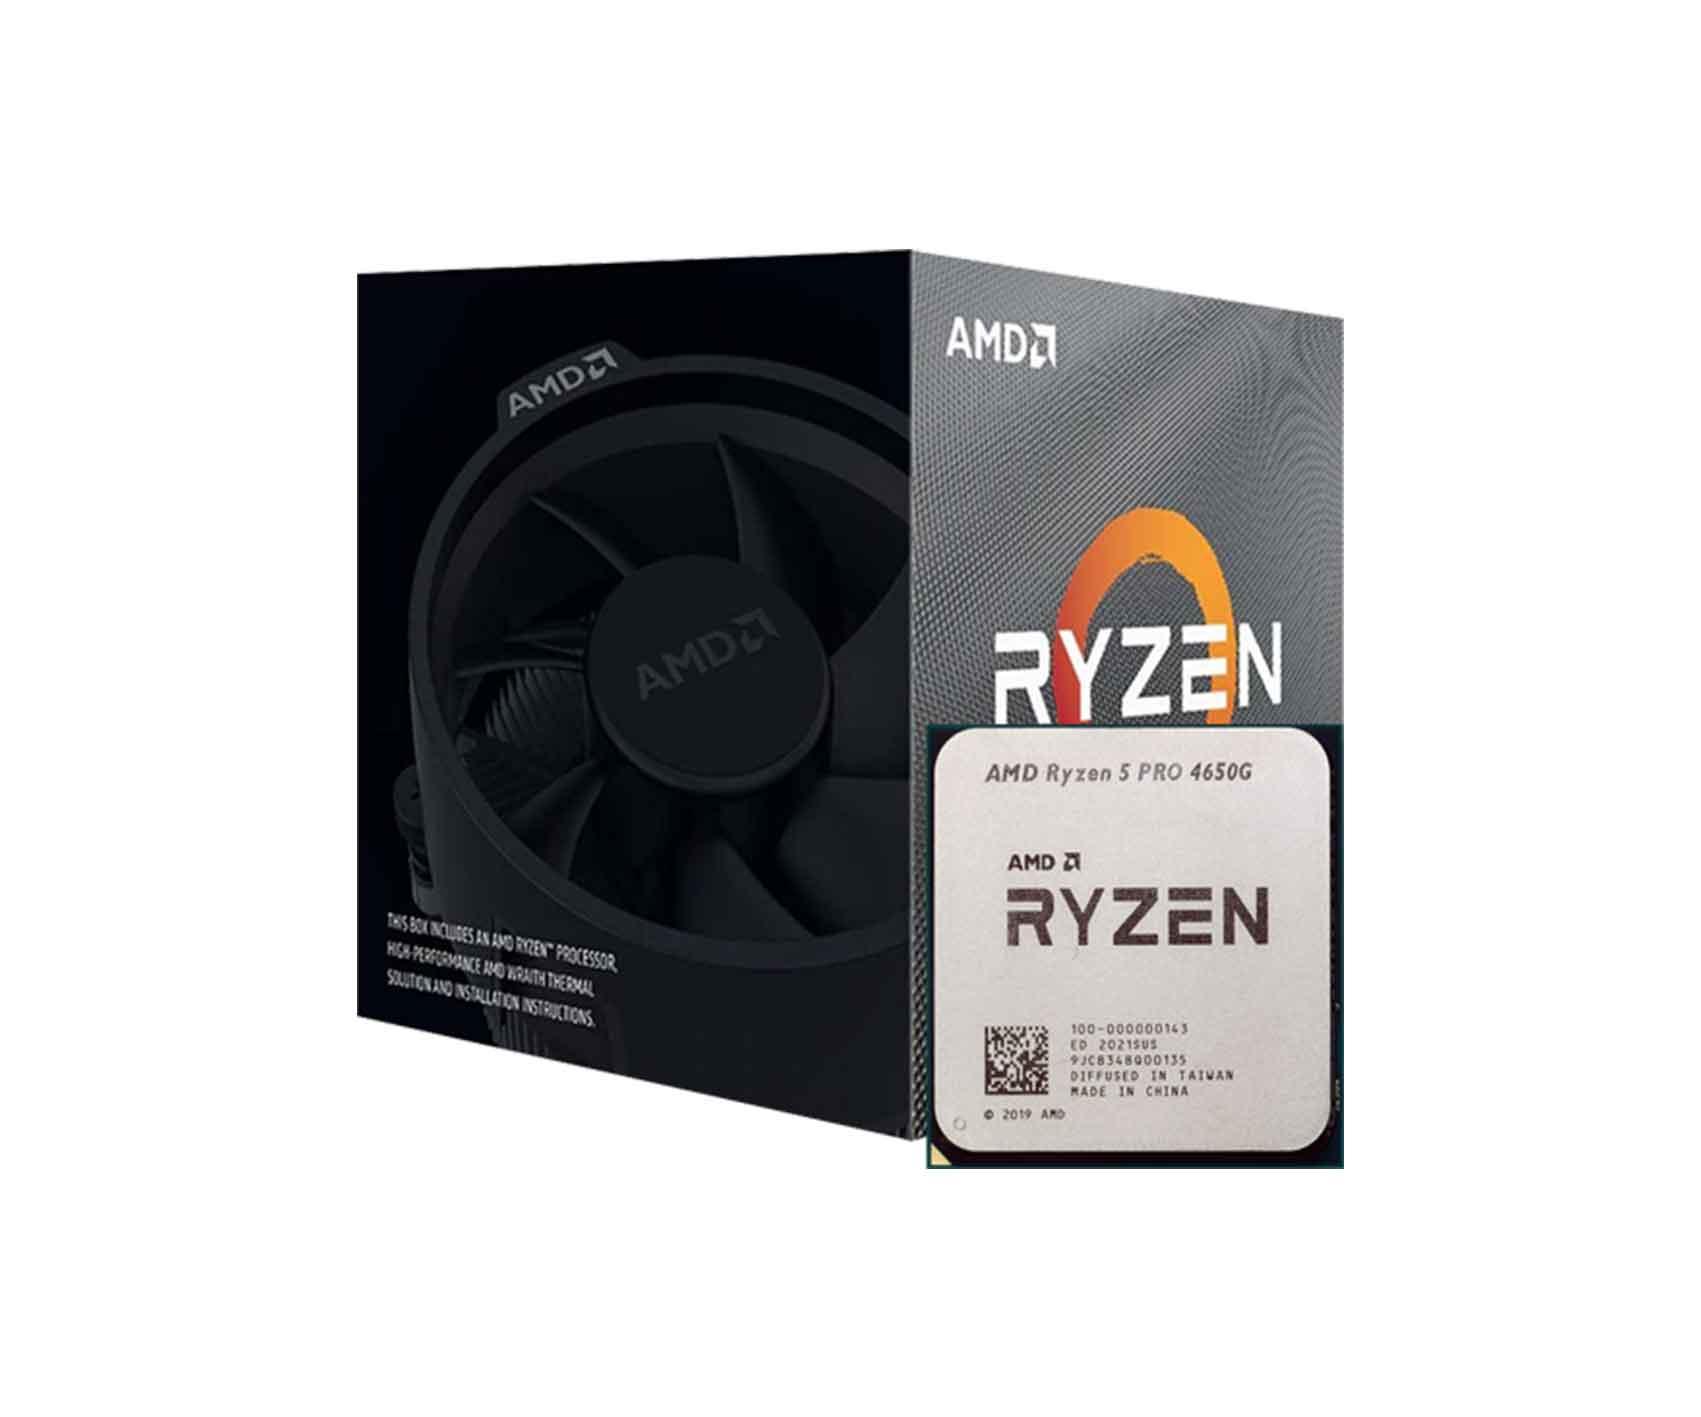 Amd Ryzen 5 pro 4650G Processor